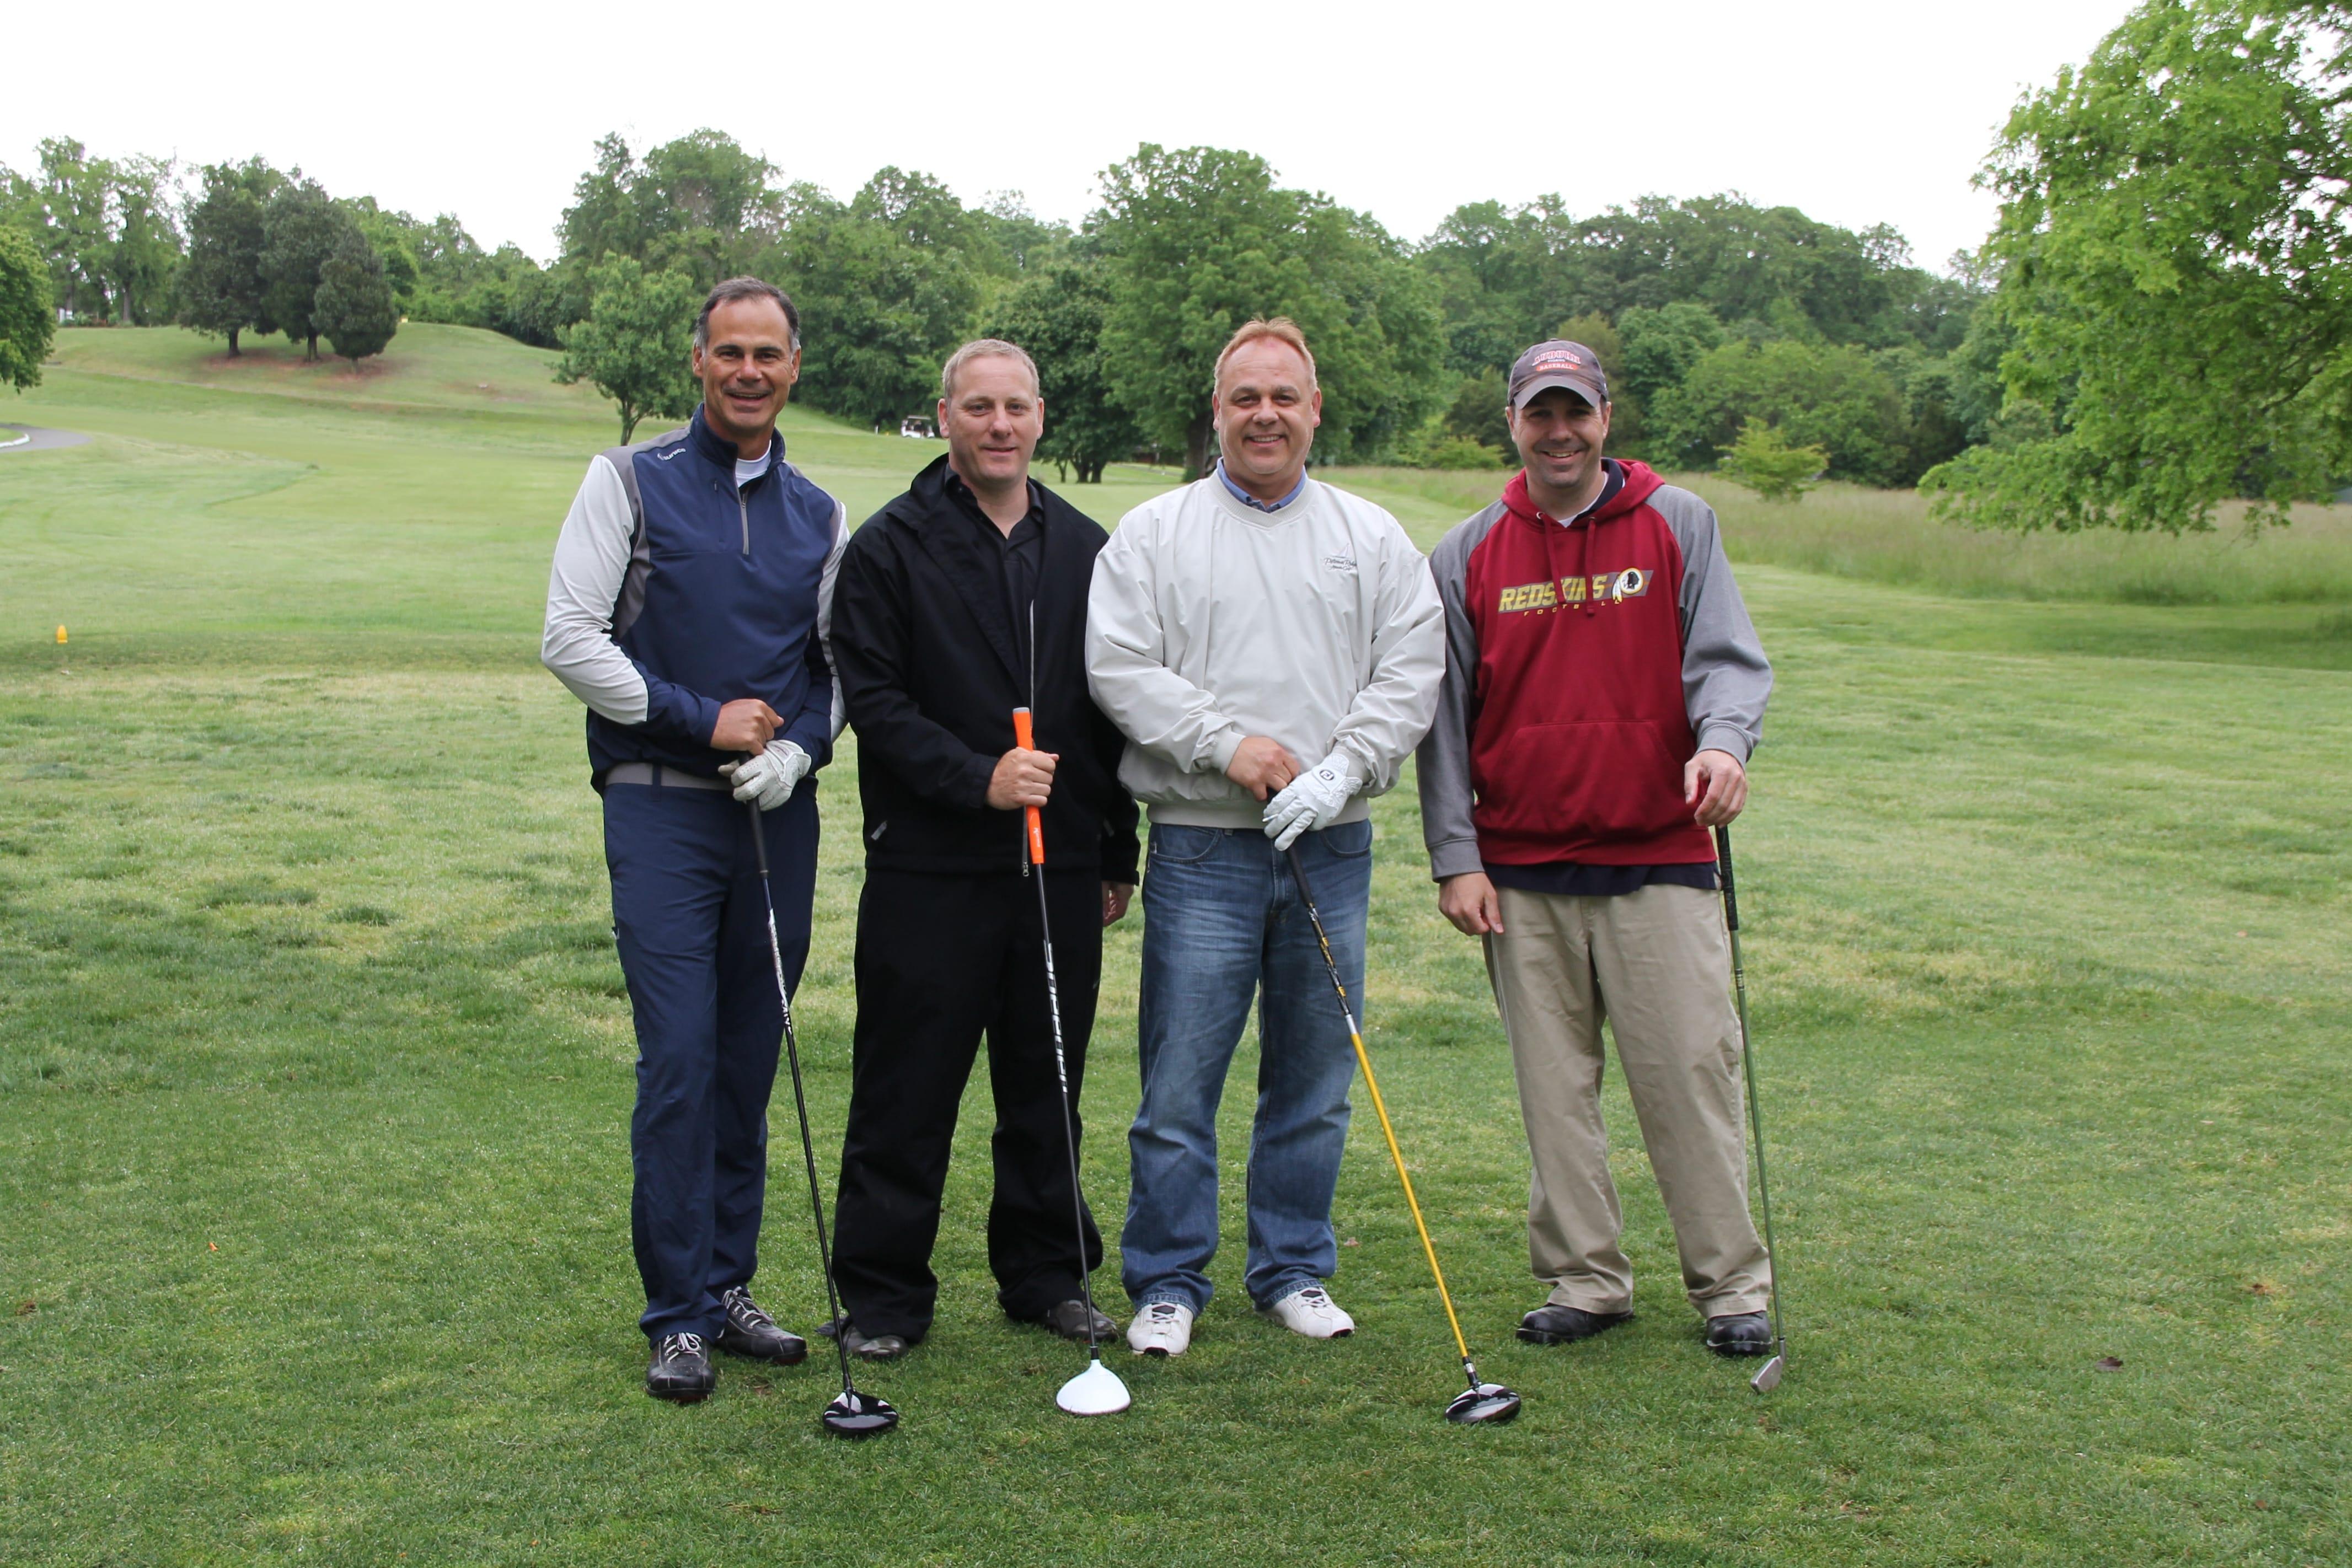 IMG_5936 - Team 13 - Chris Furfaro, Rich Ciabattoni, Dave Ford, James Pouncey